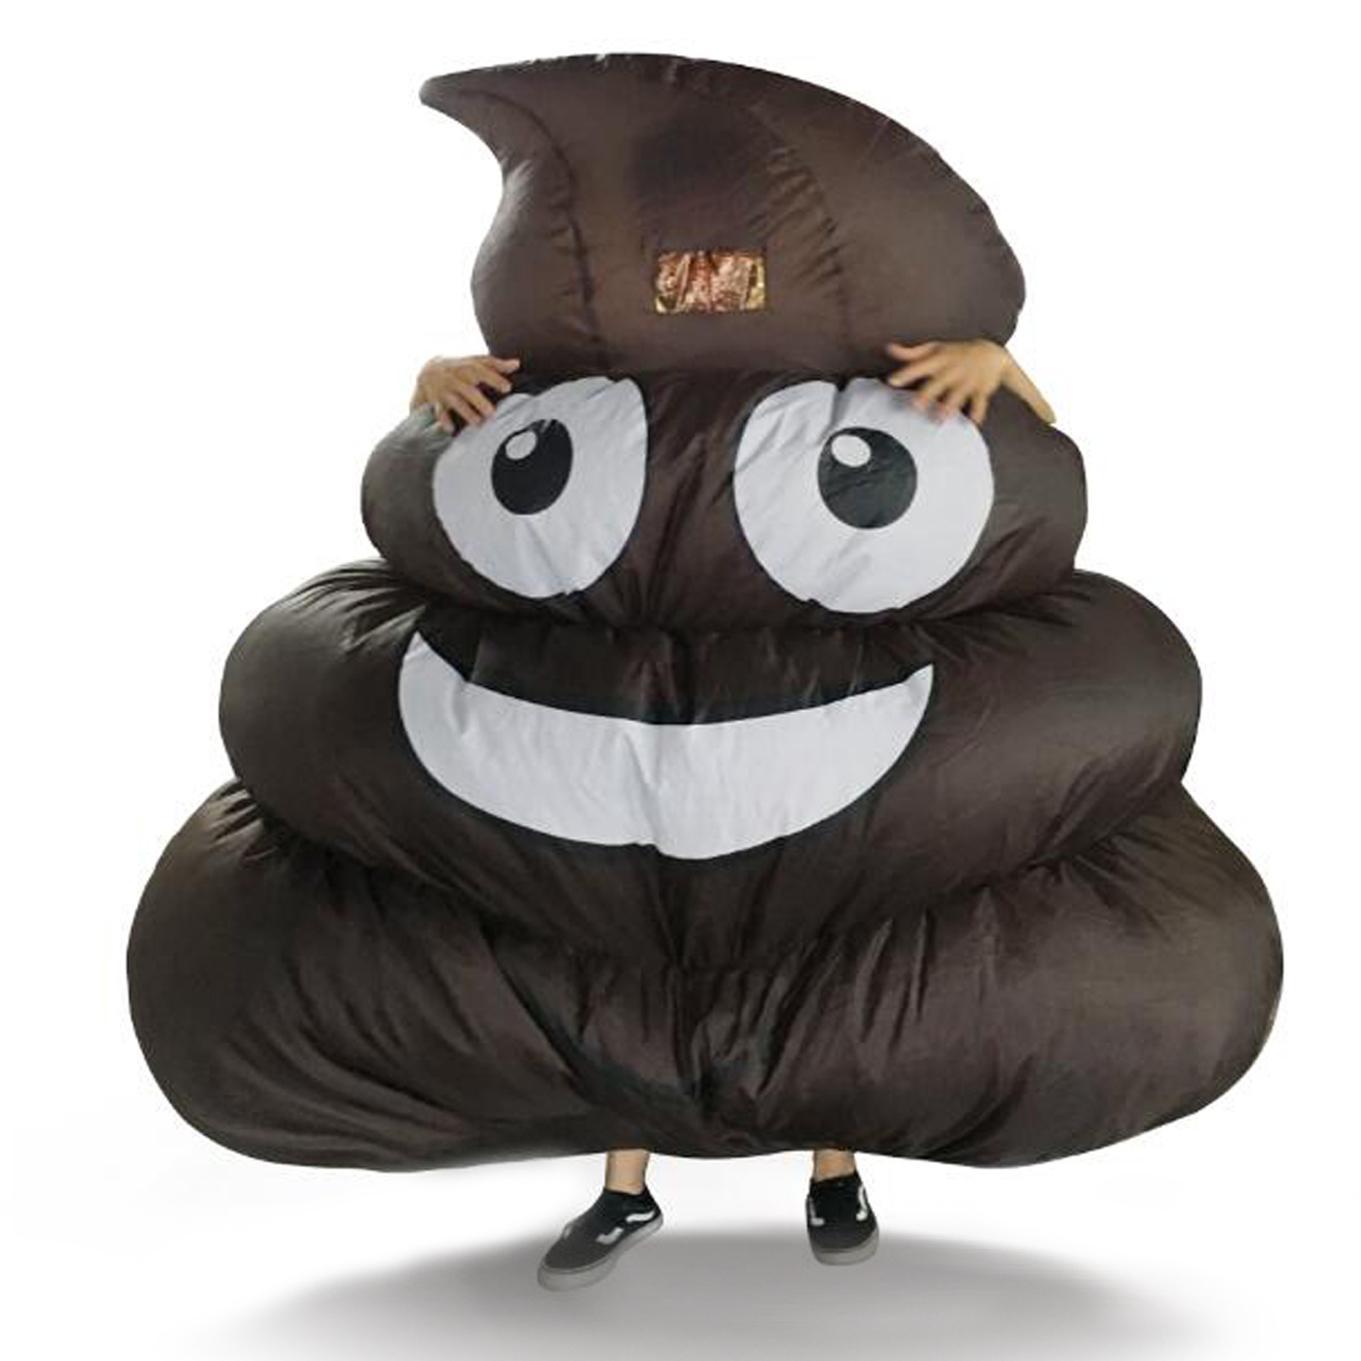 2017 Adult Kids Giant Inflatable Emoji Poop Costume T Rex ...